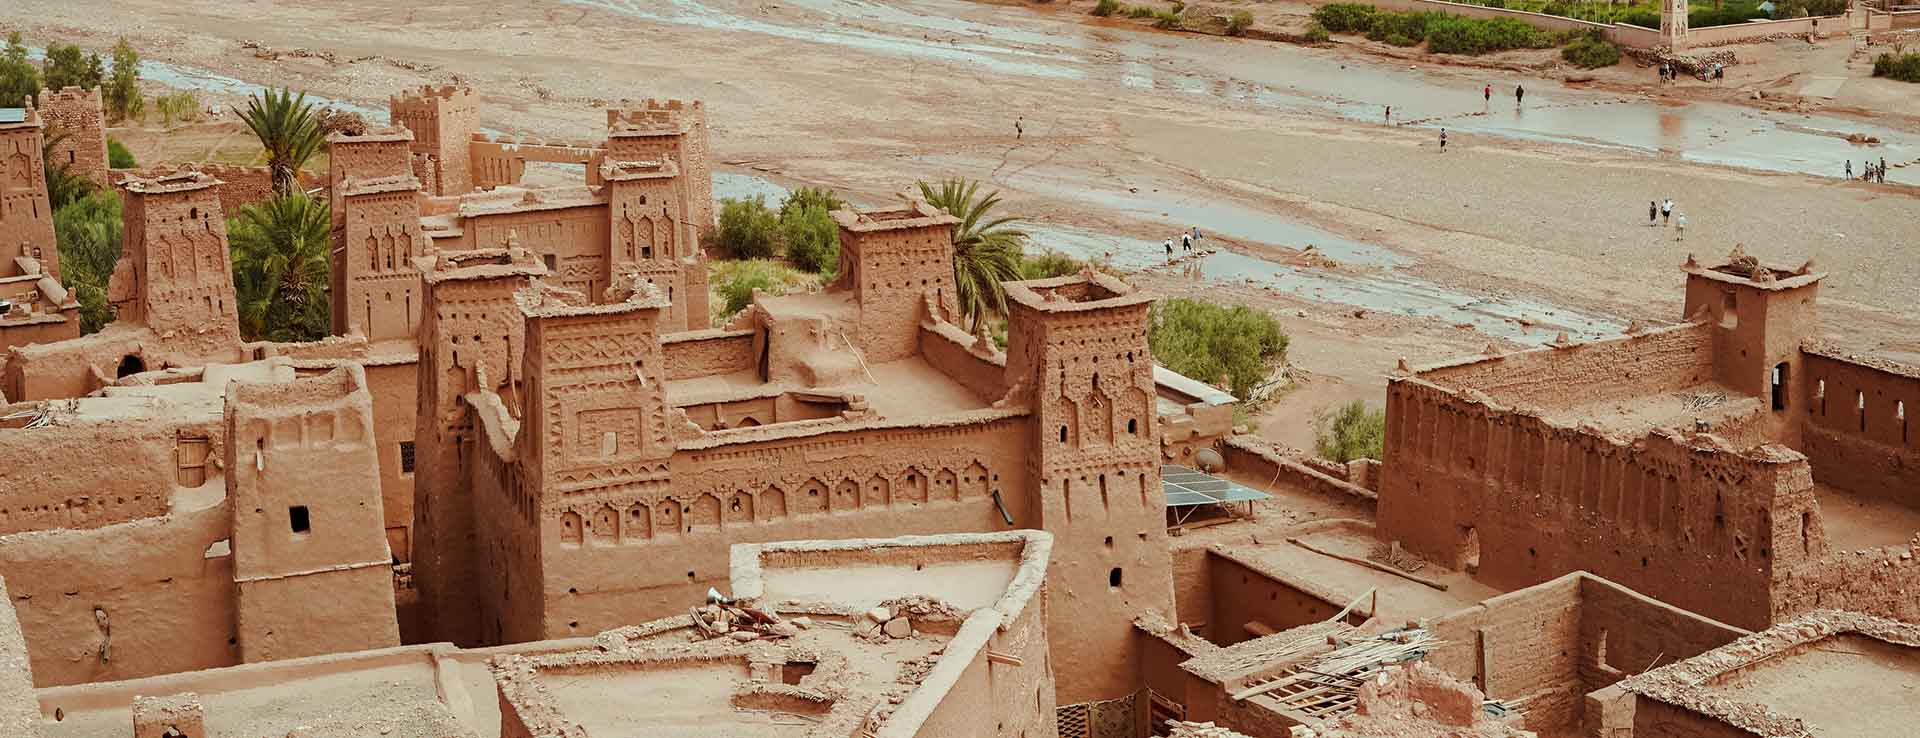 11Morocco travel tips